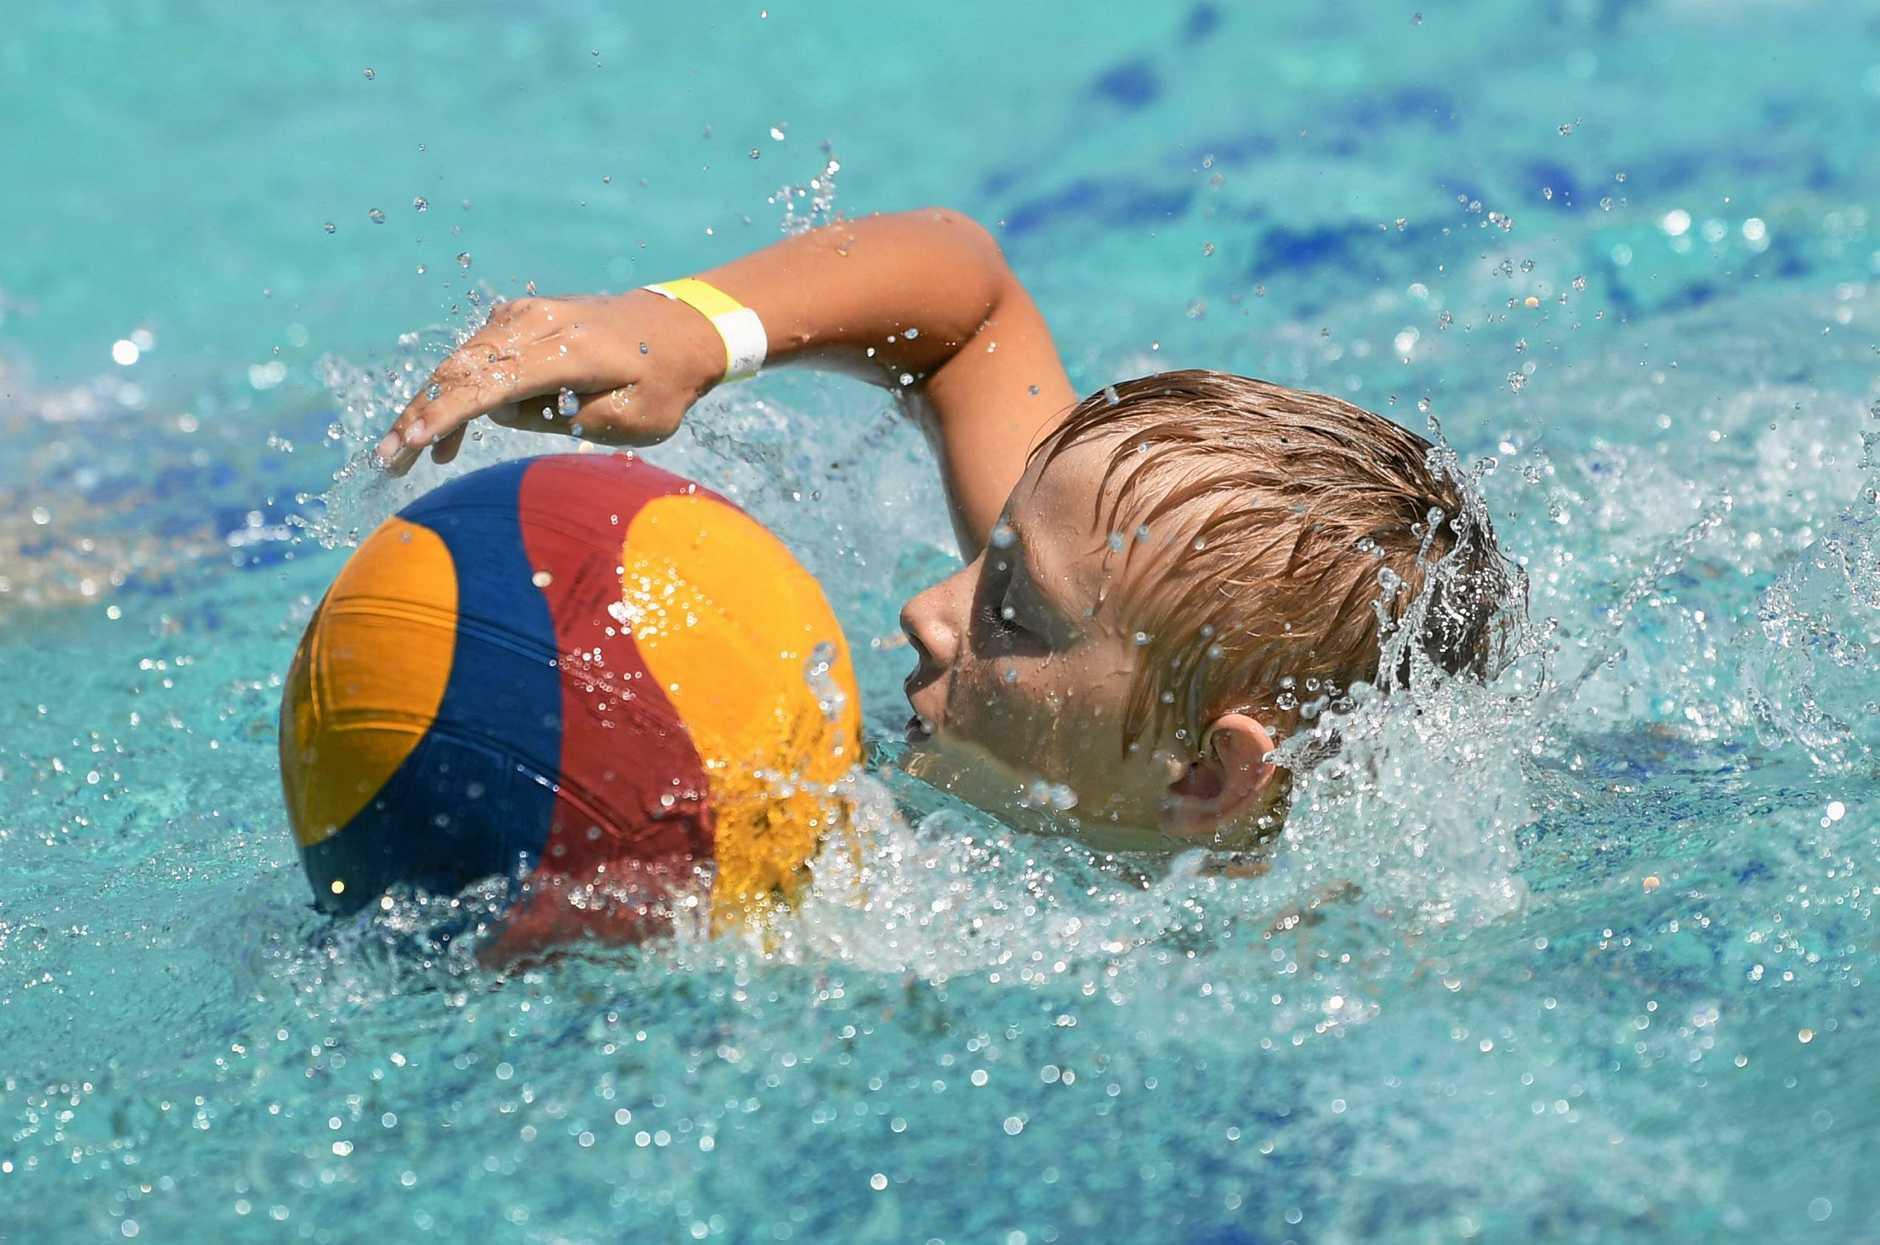 Water Polo clinic - Riley Hancock dribbling the ball.